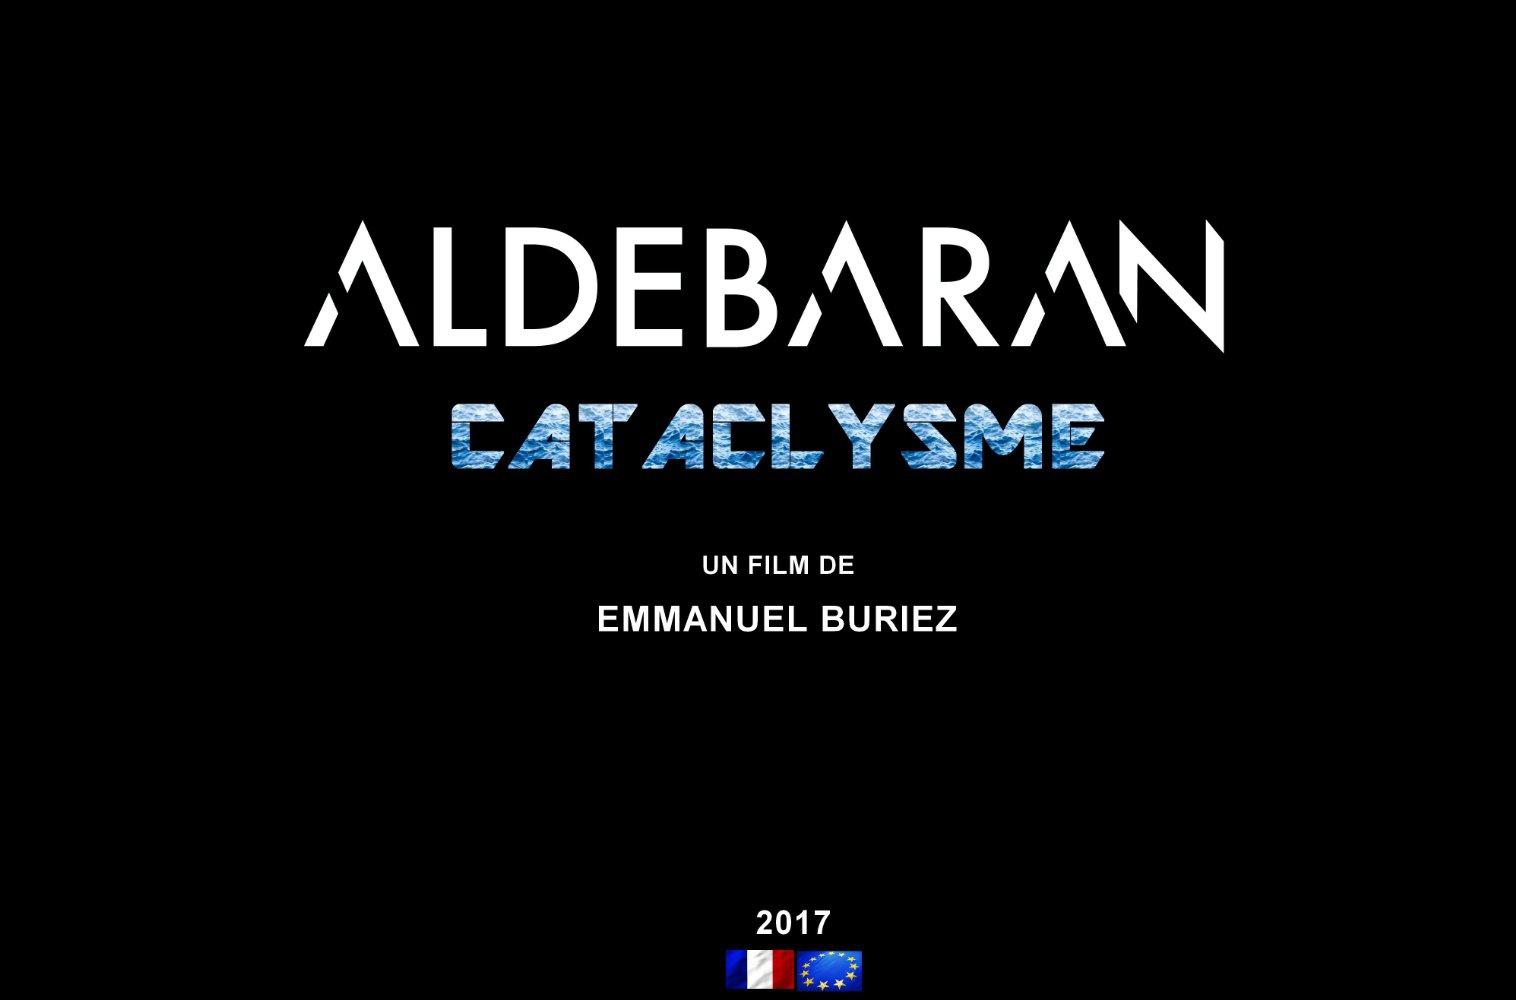 Aldebaran Cataclysme (2017)